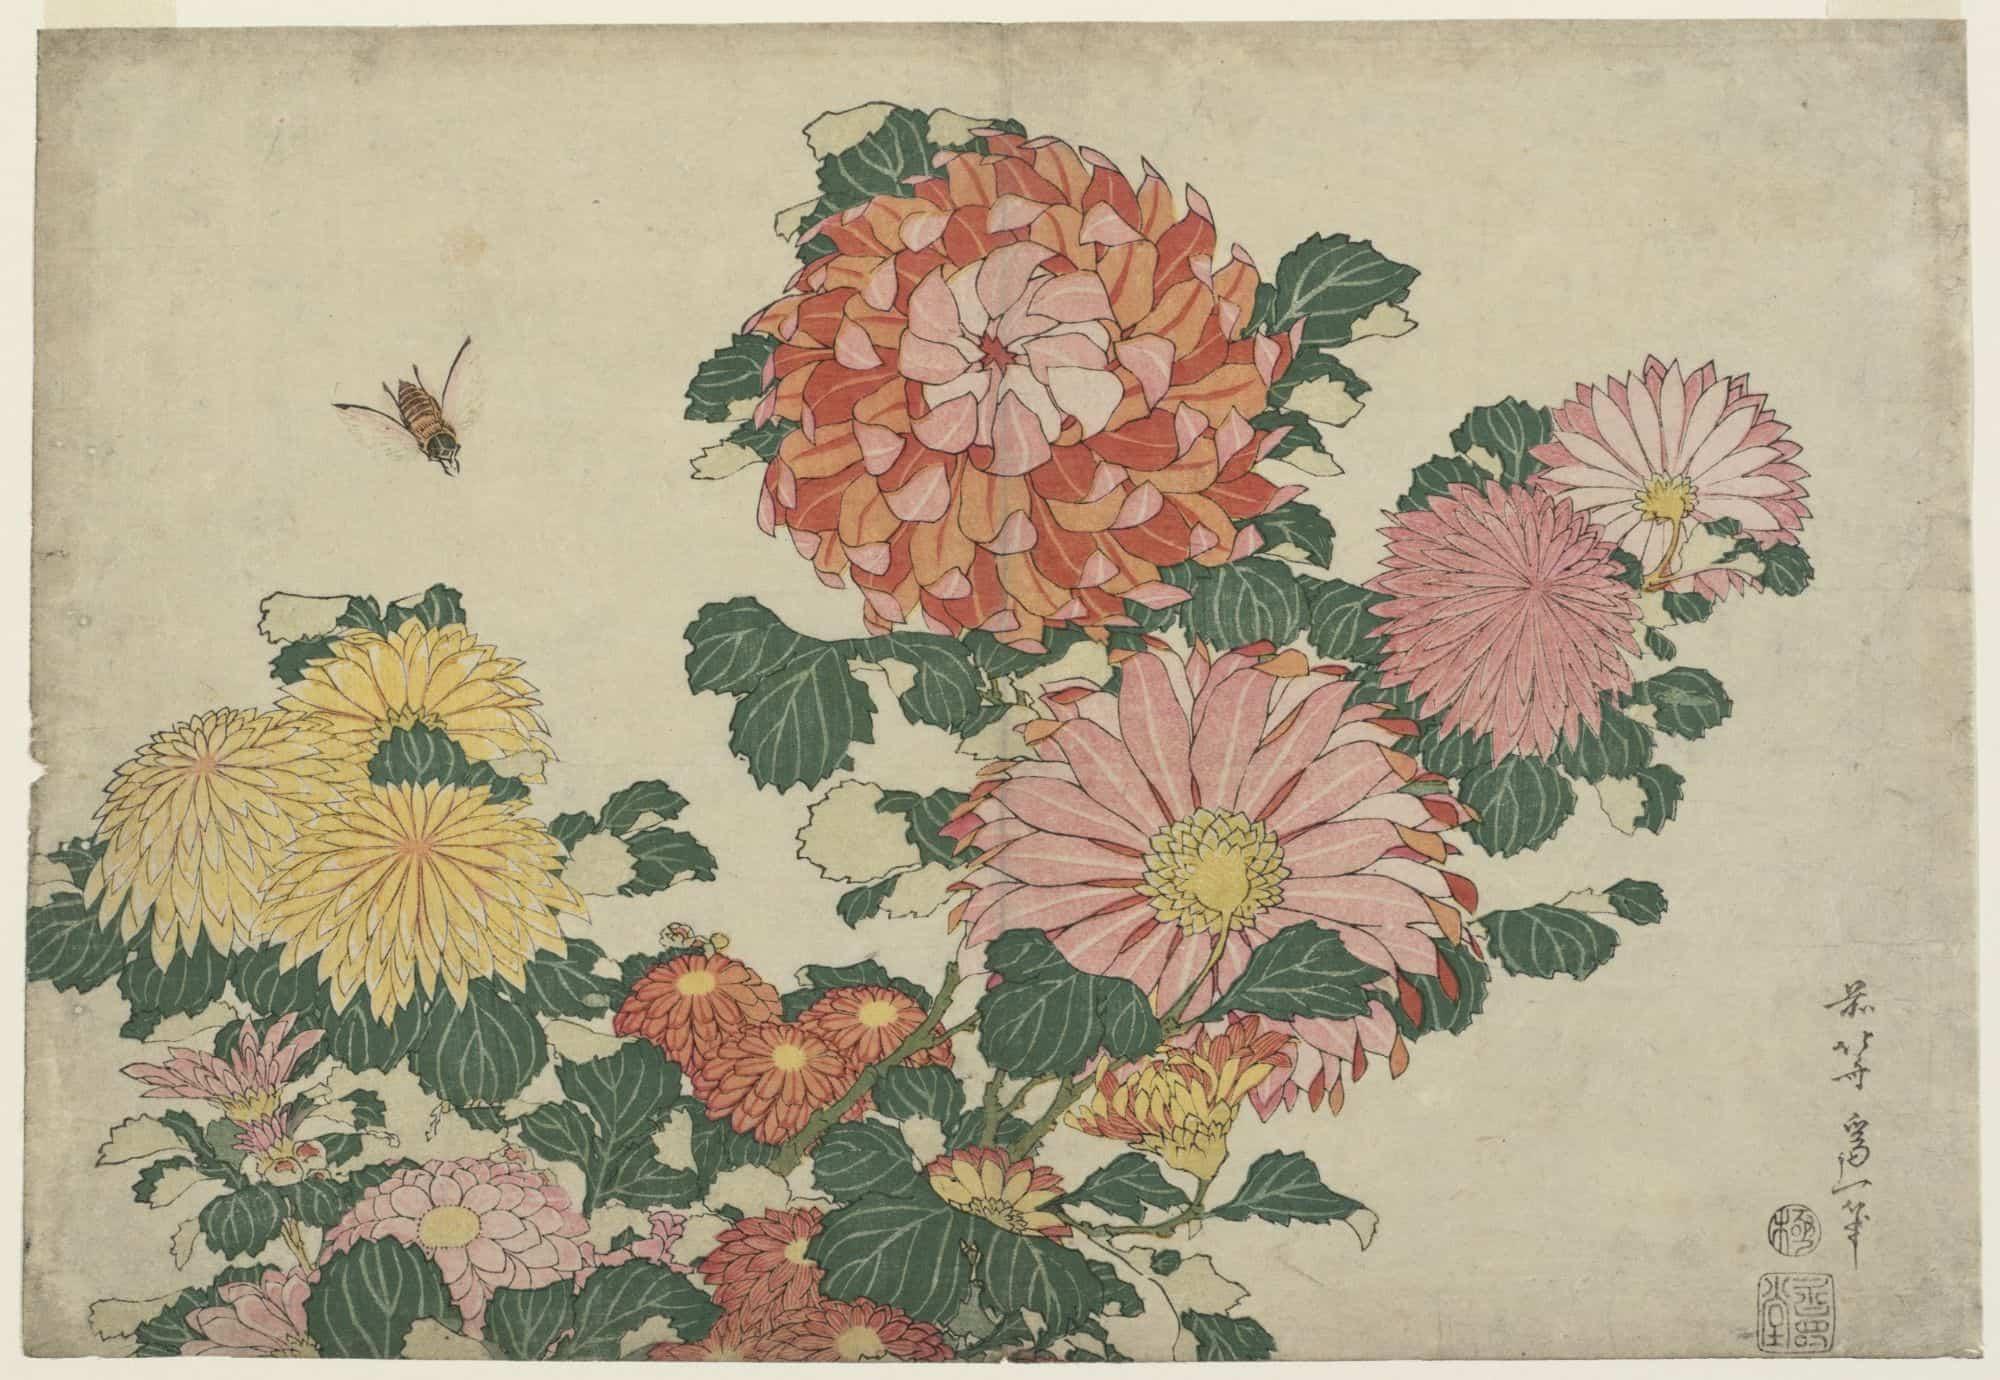 Chrysanthemums and Horsefly by hokusai, kacho-ga